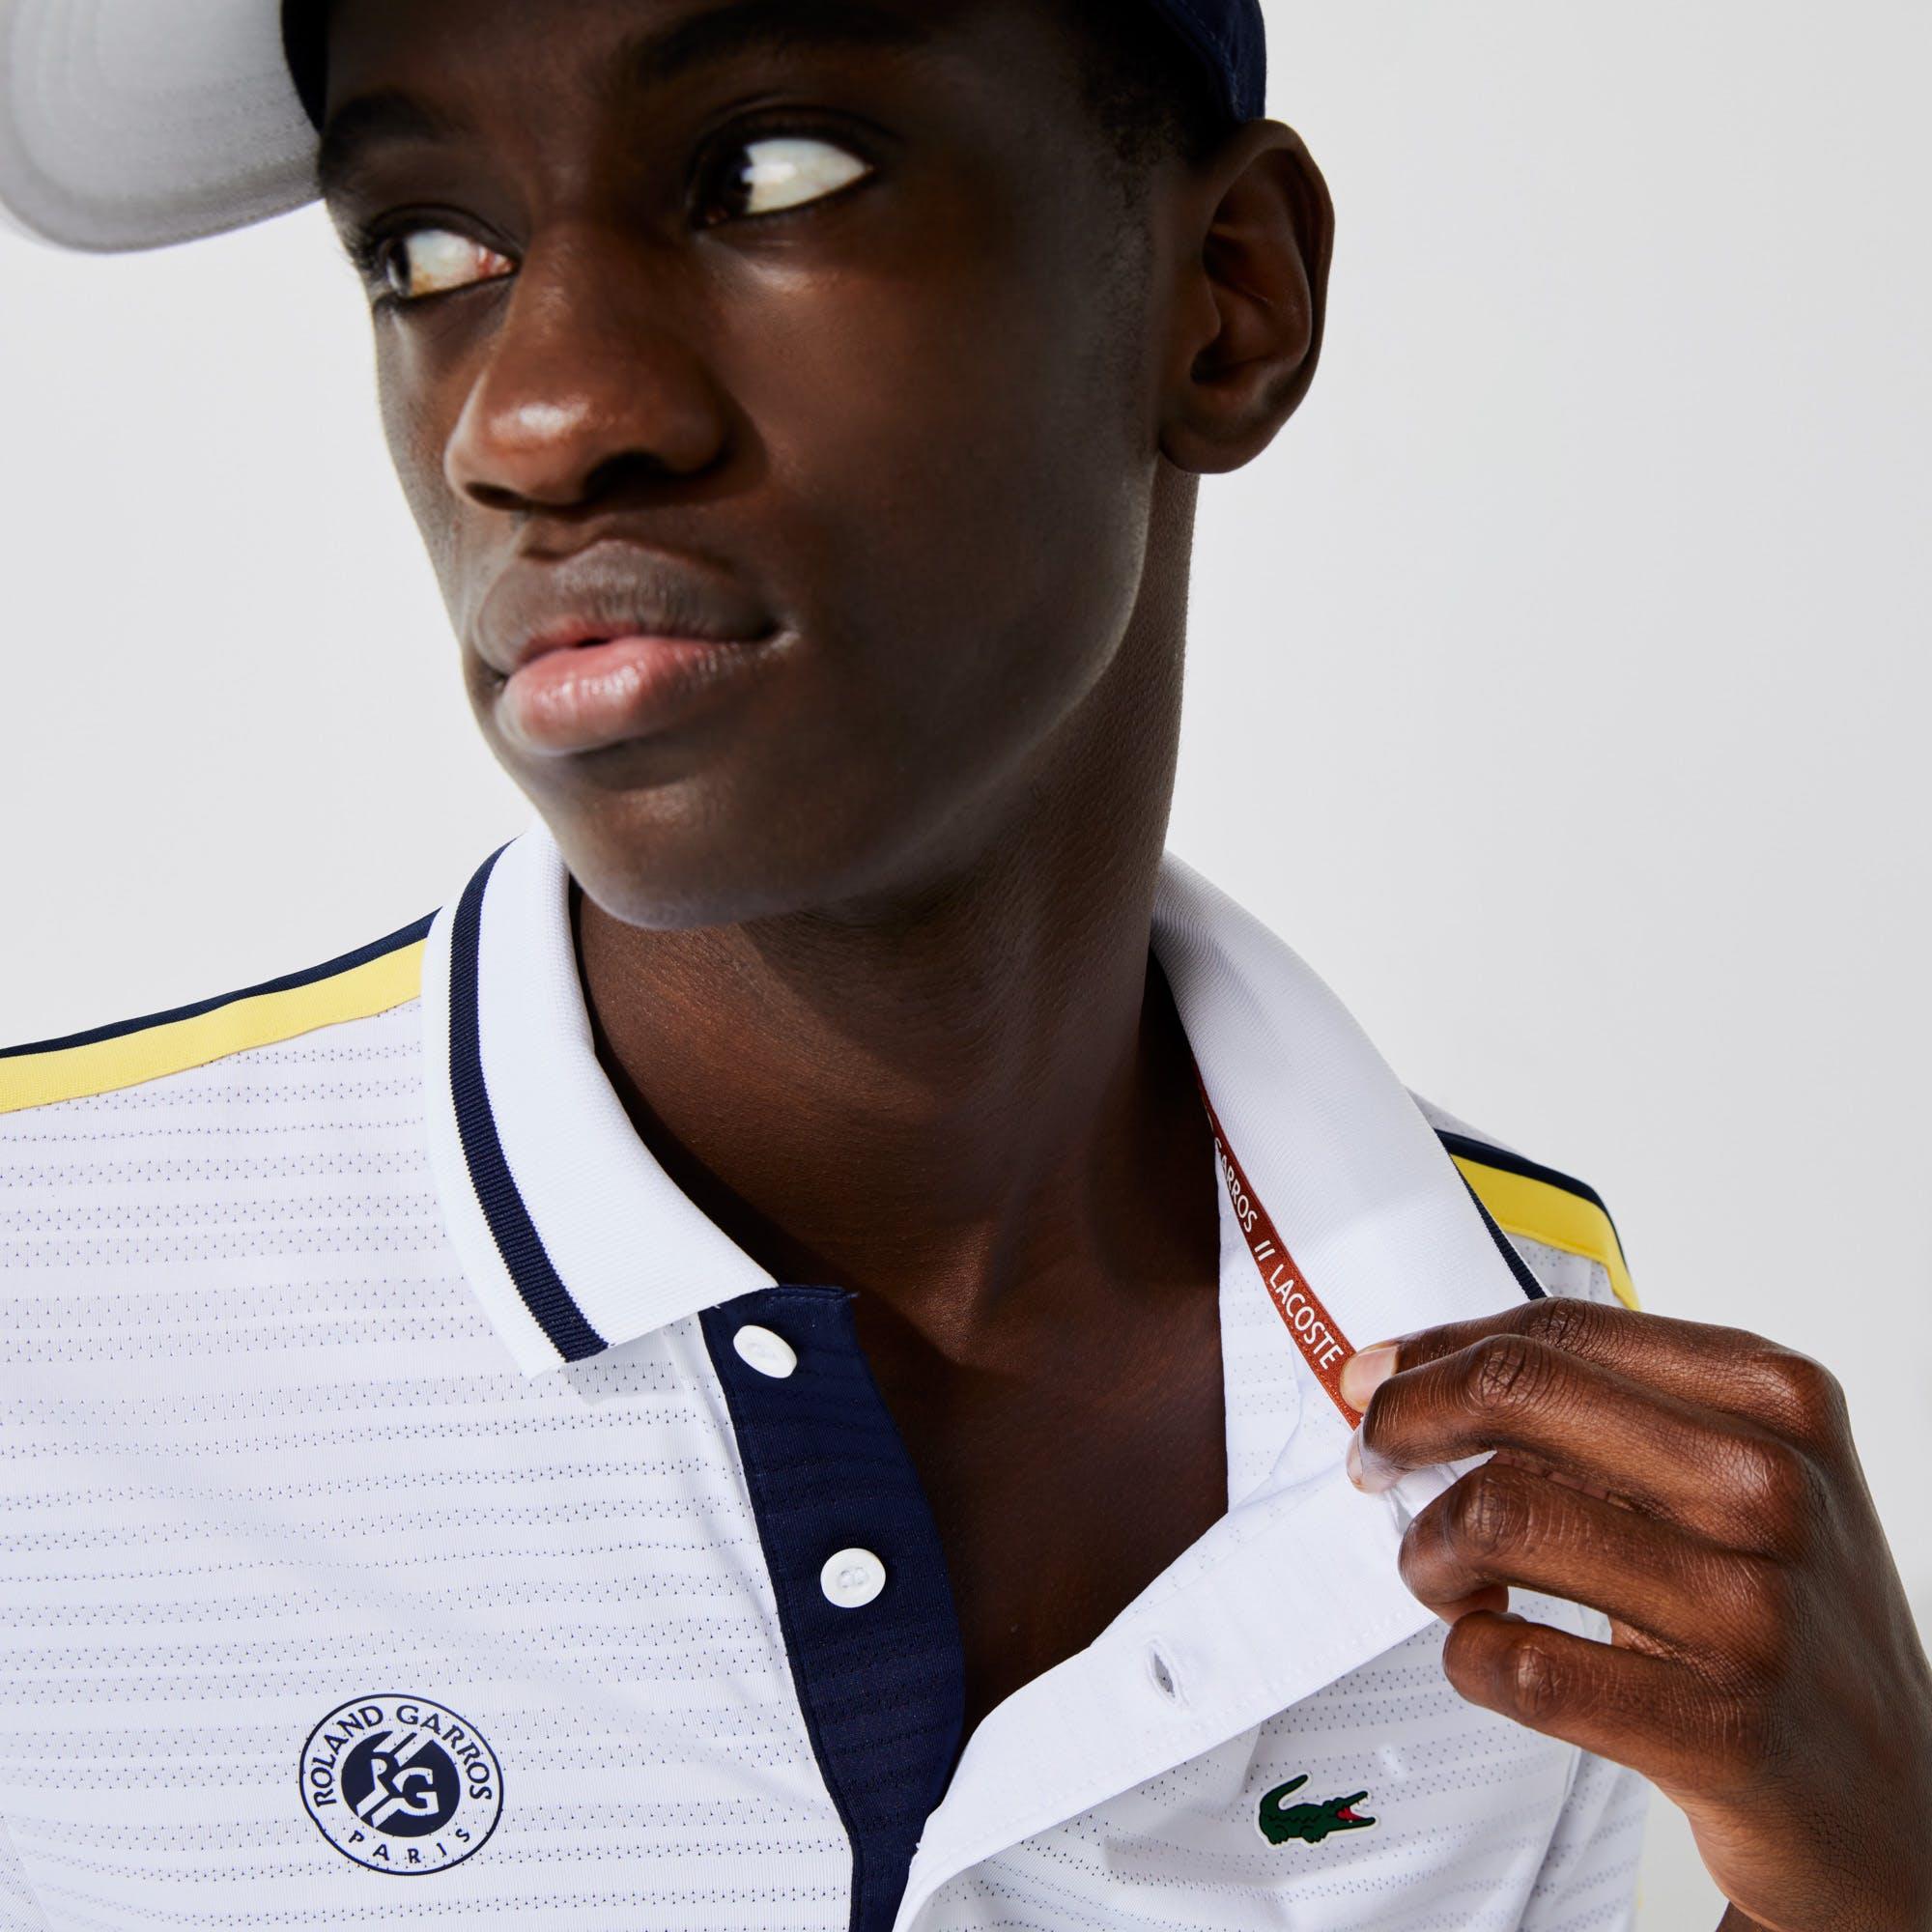 Lacoste Performance Polo Roland-Garros 2021